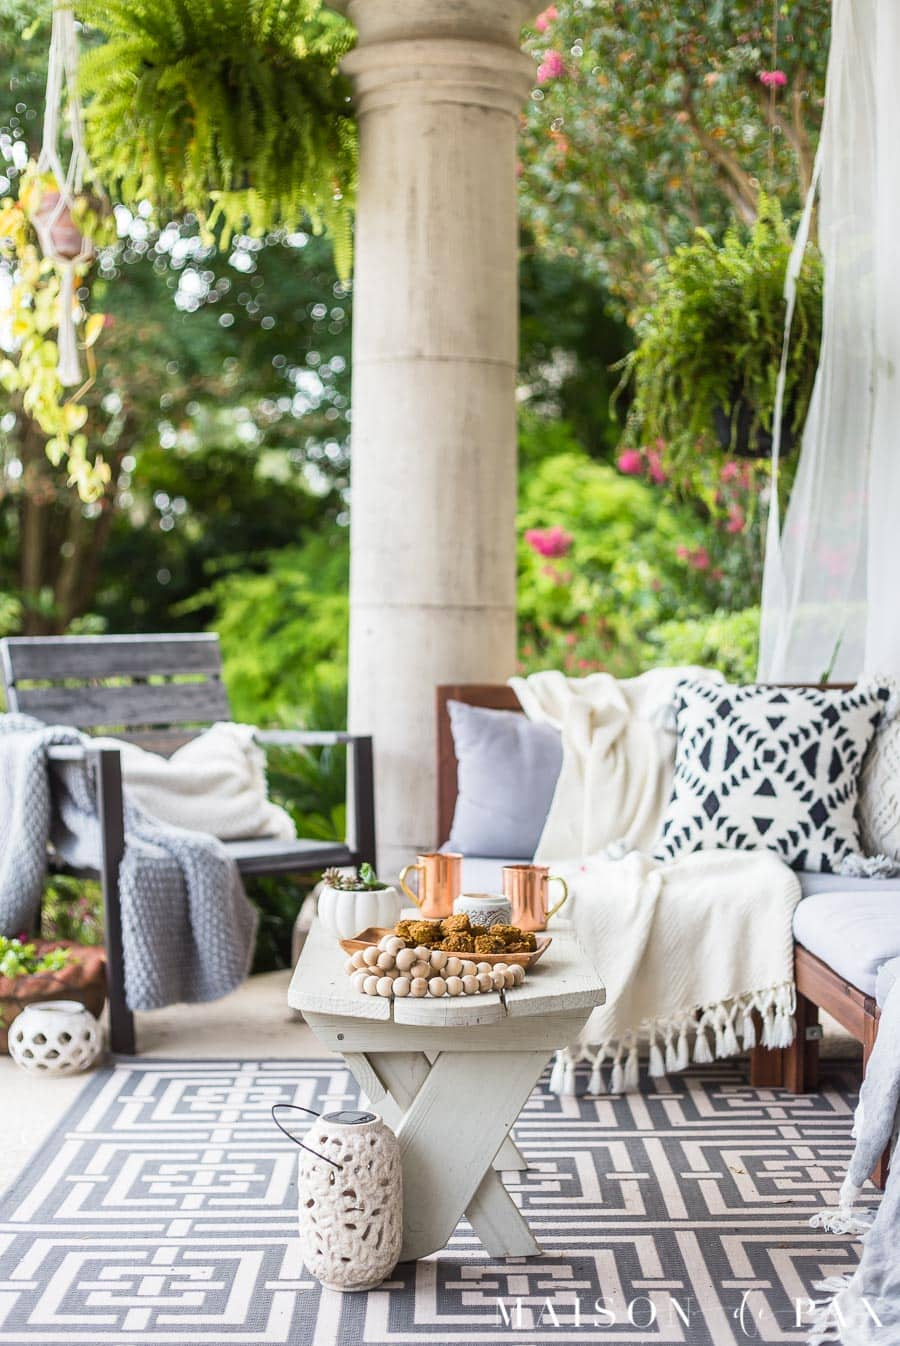 Black and White Fall Porch Decorating Ideas - Maison de Pax on Black And White Backyard Decor  id=74009